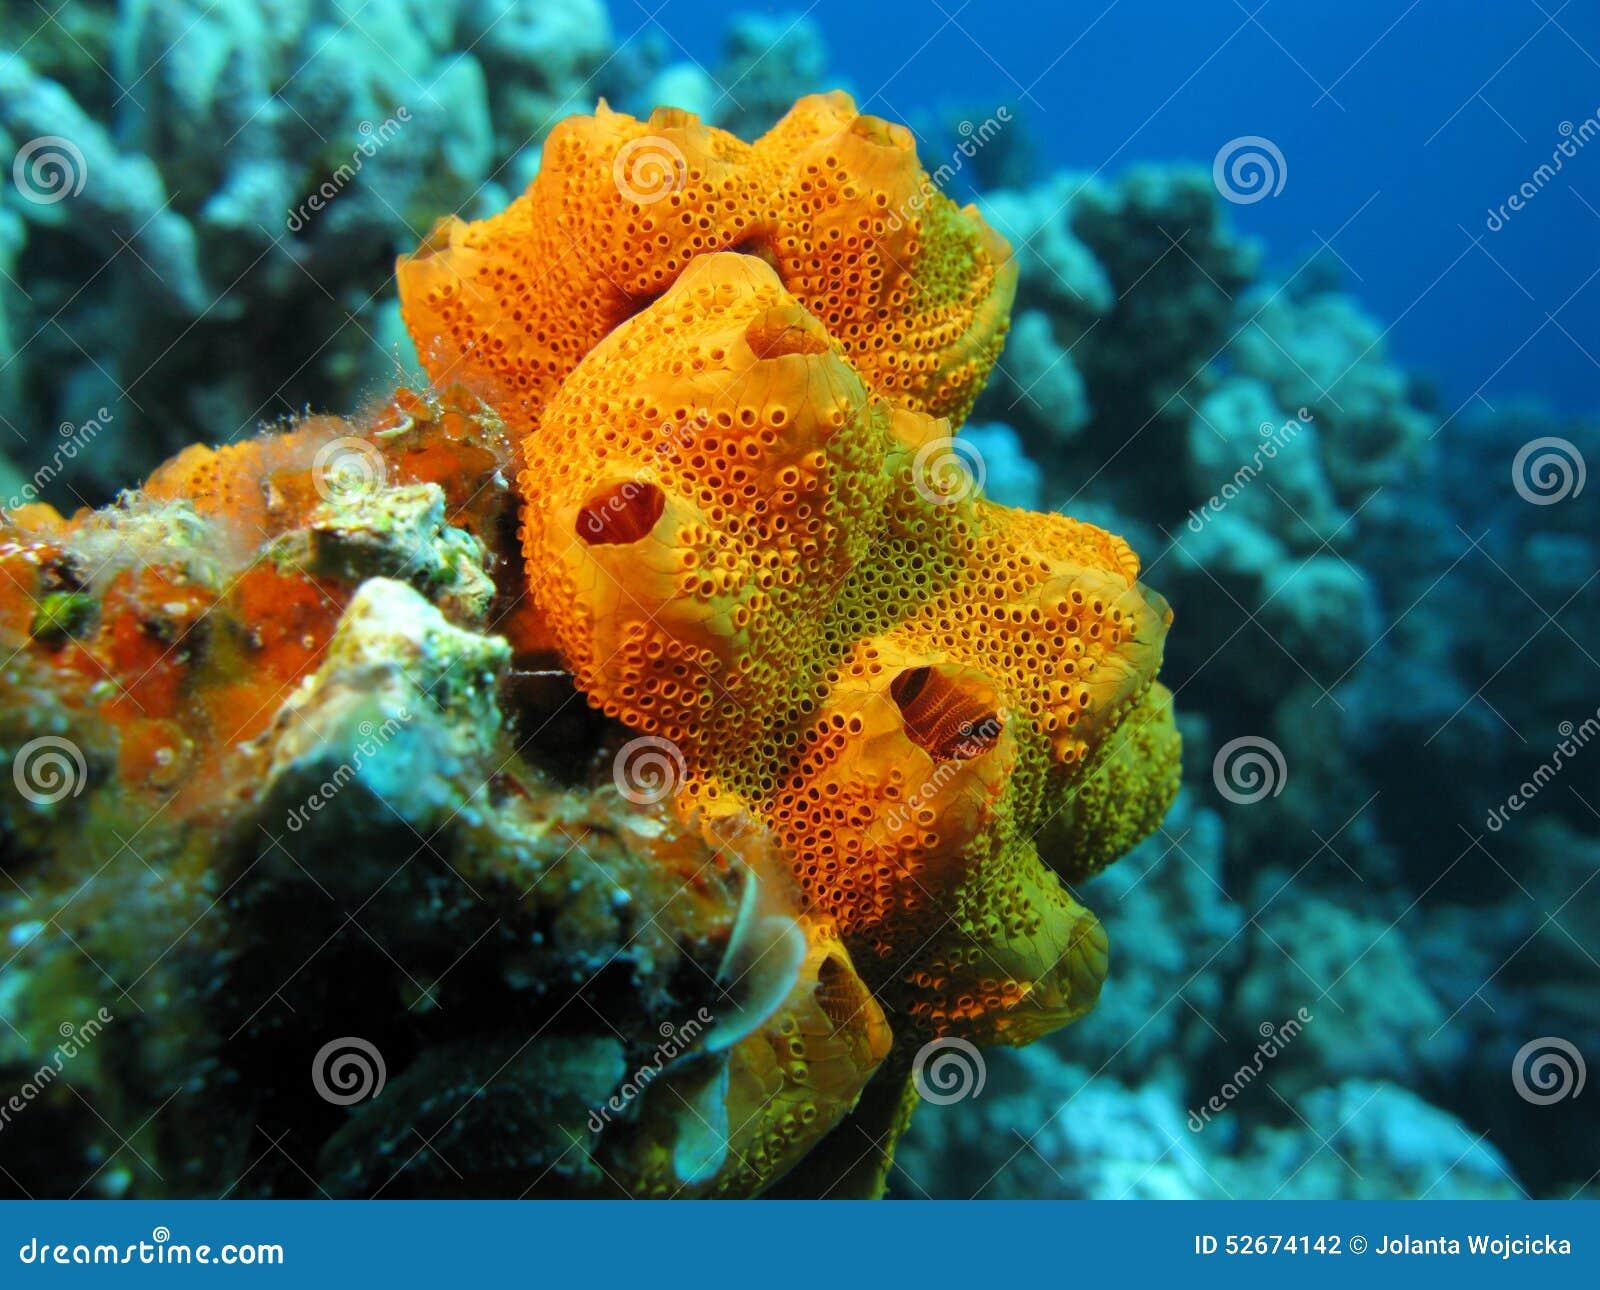 Barriera corallina con la bella grande spugna arancio del mare, subacquea